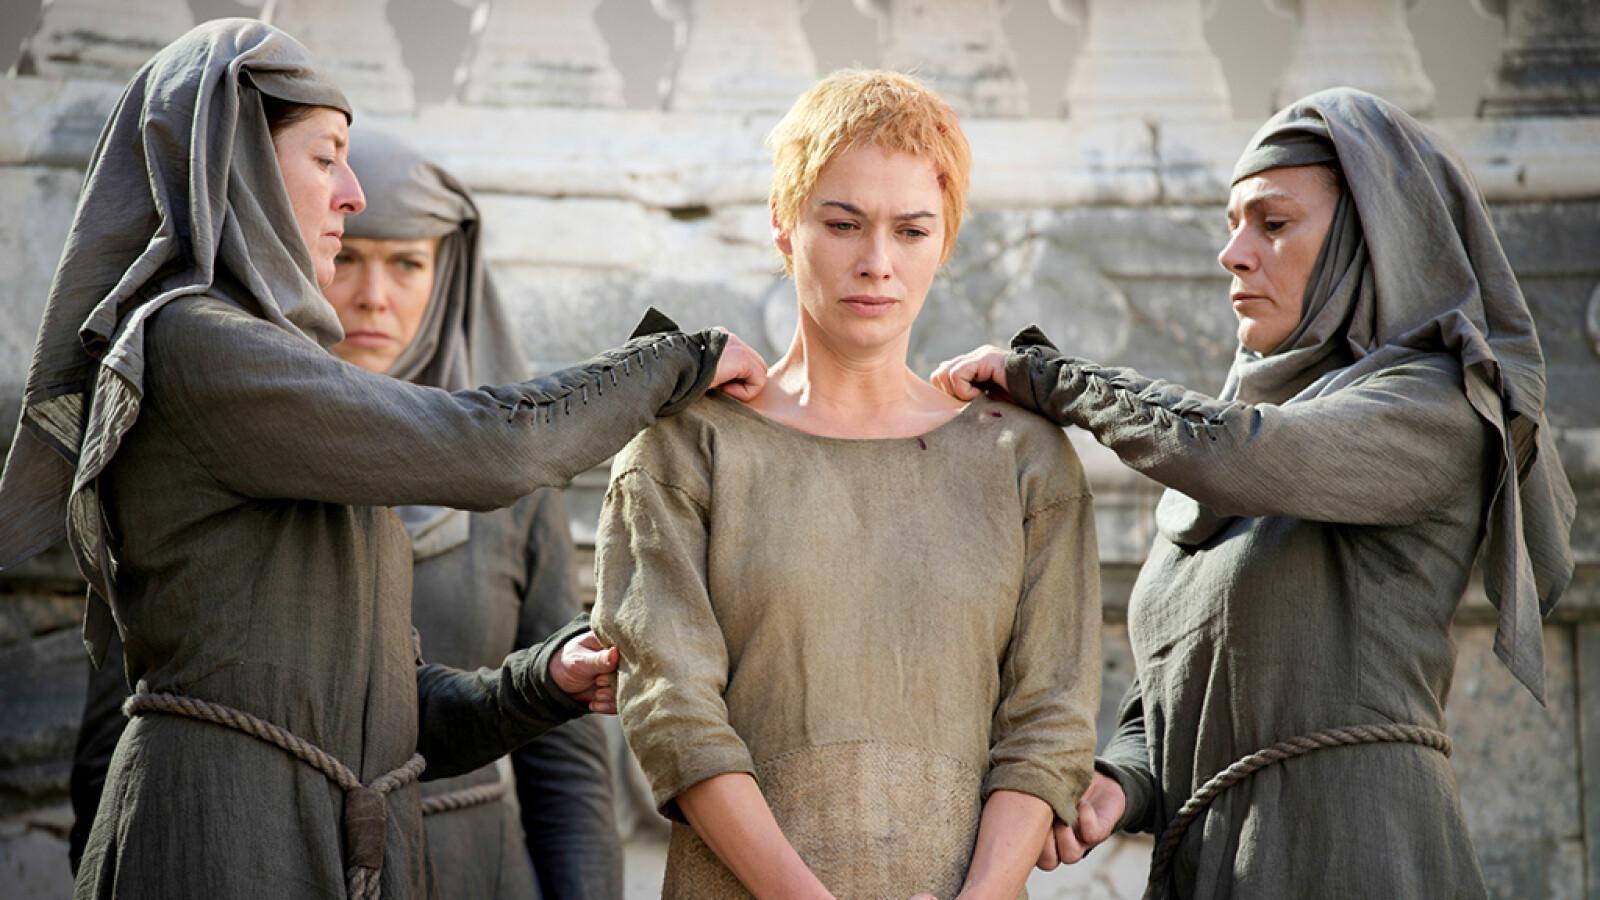 Spiel Ofthrones Staffel 5